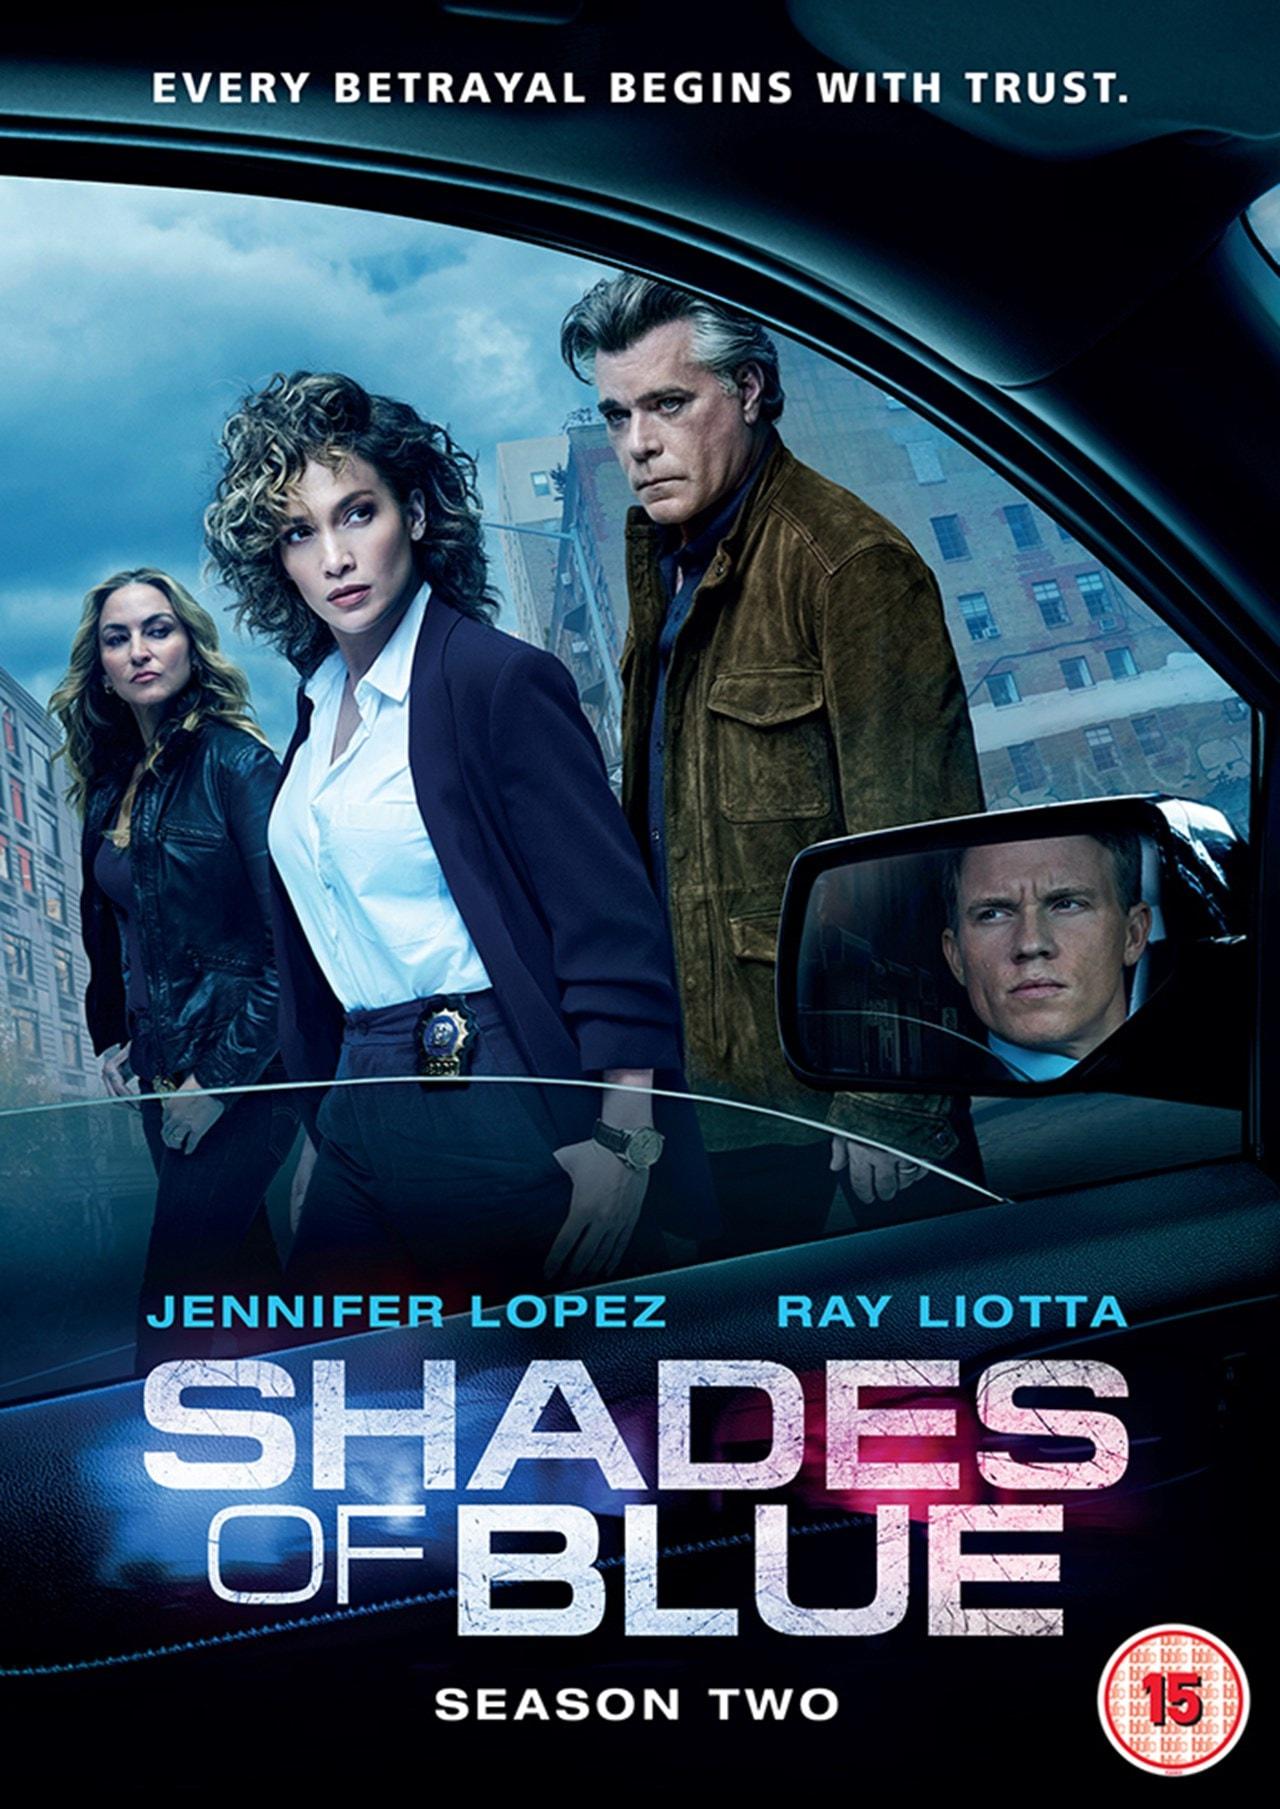 Shades Of Blue Season Two Dvd Box Set Free Shipping Over 20 Hmv Store